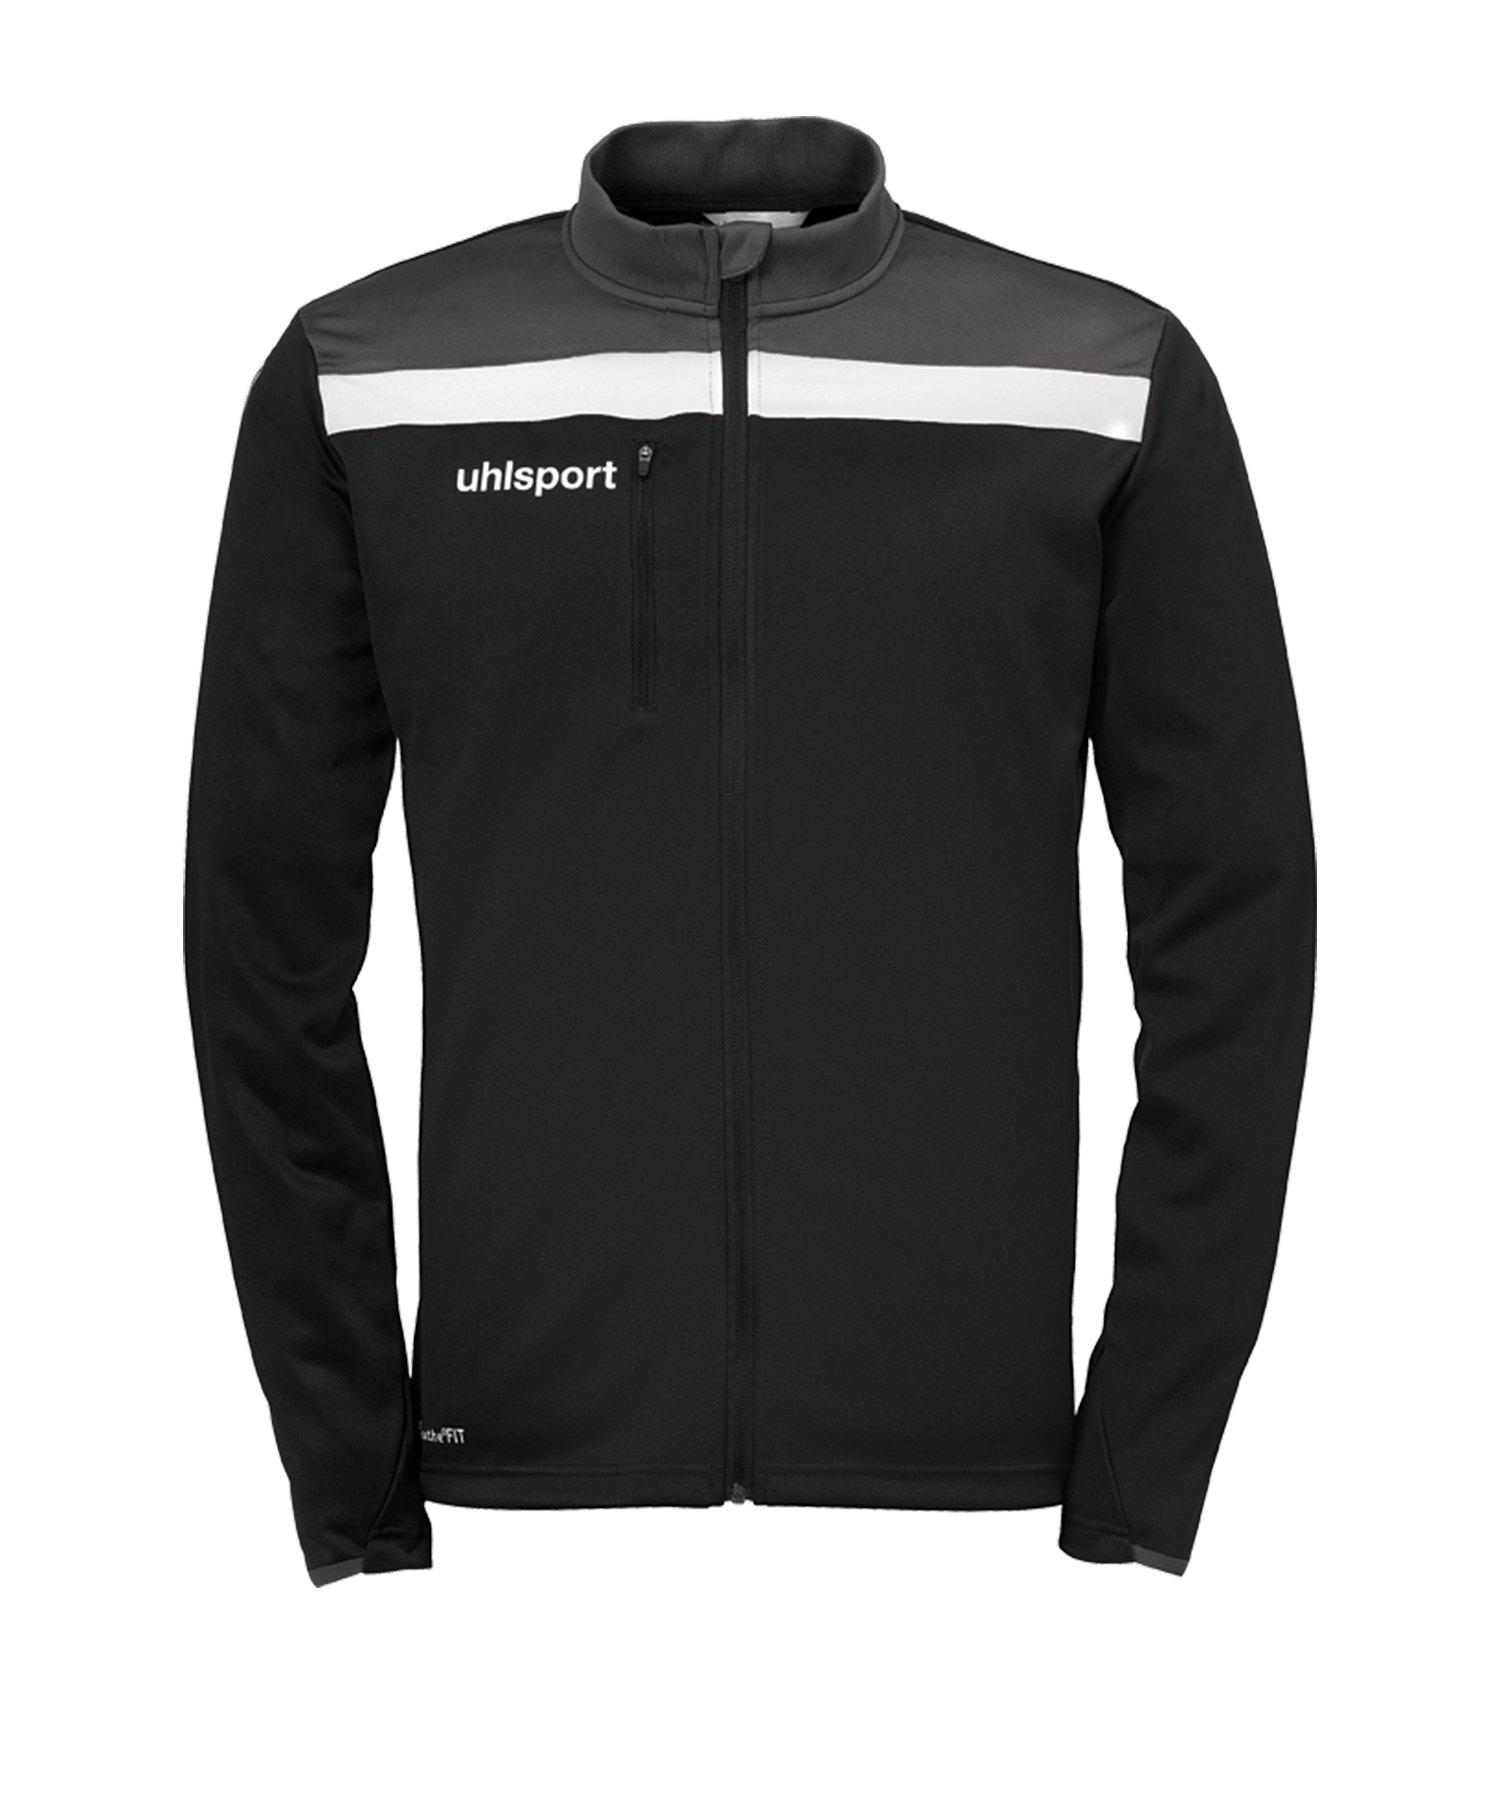 Uhlsport Offense 23 Trainingsjacke Schwarz F01 - schwarz